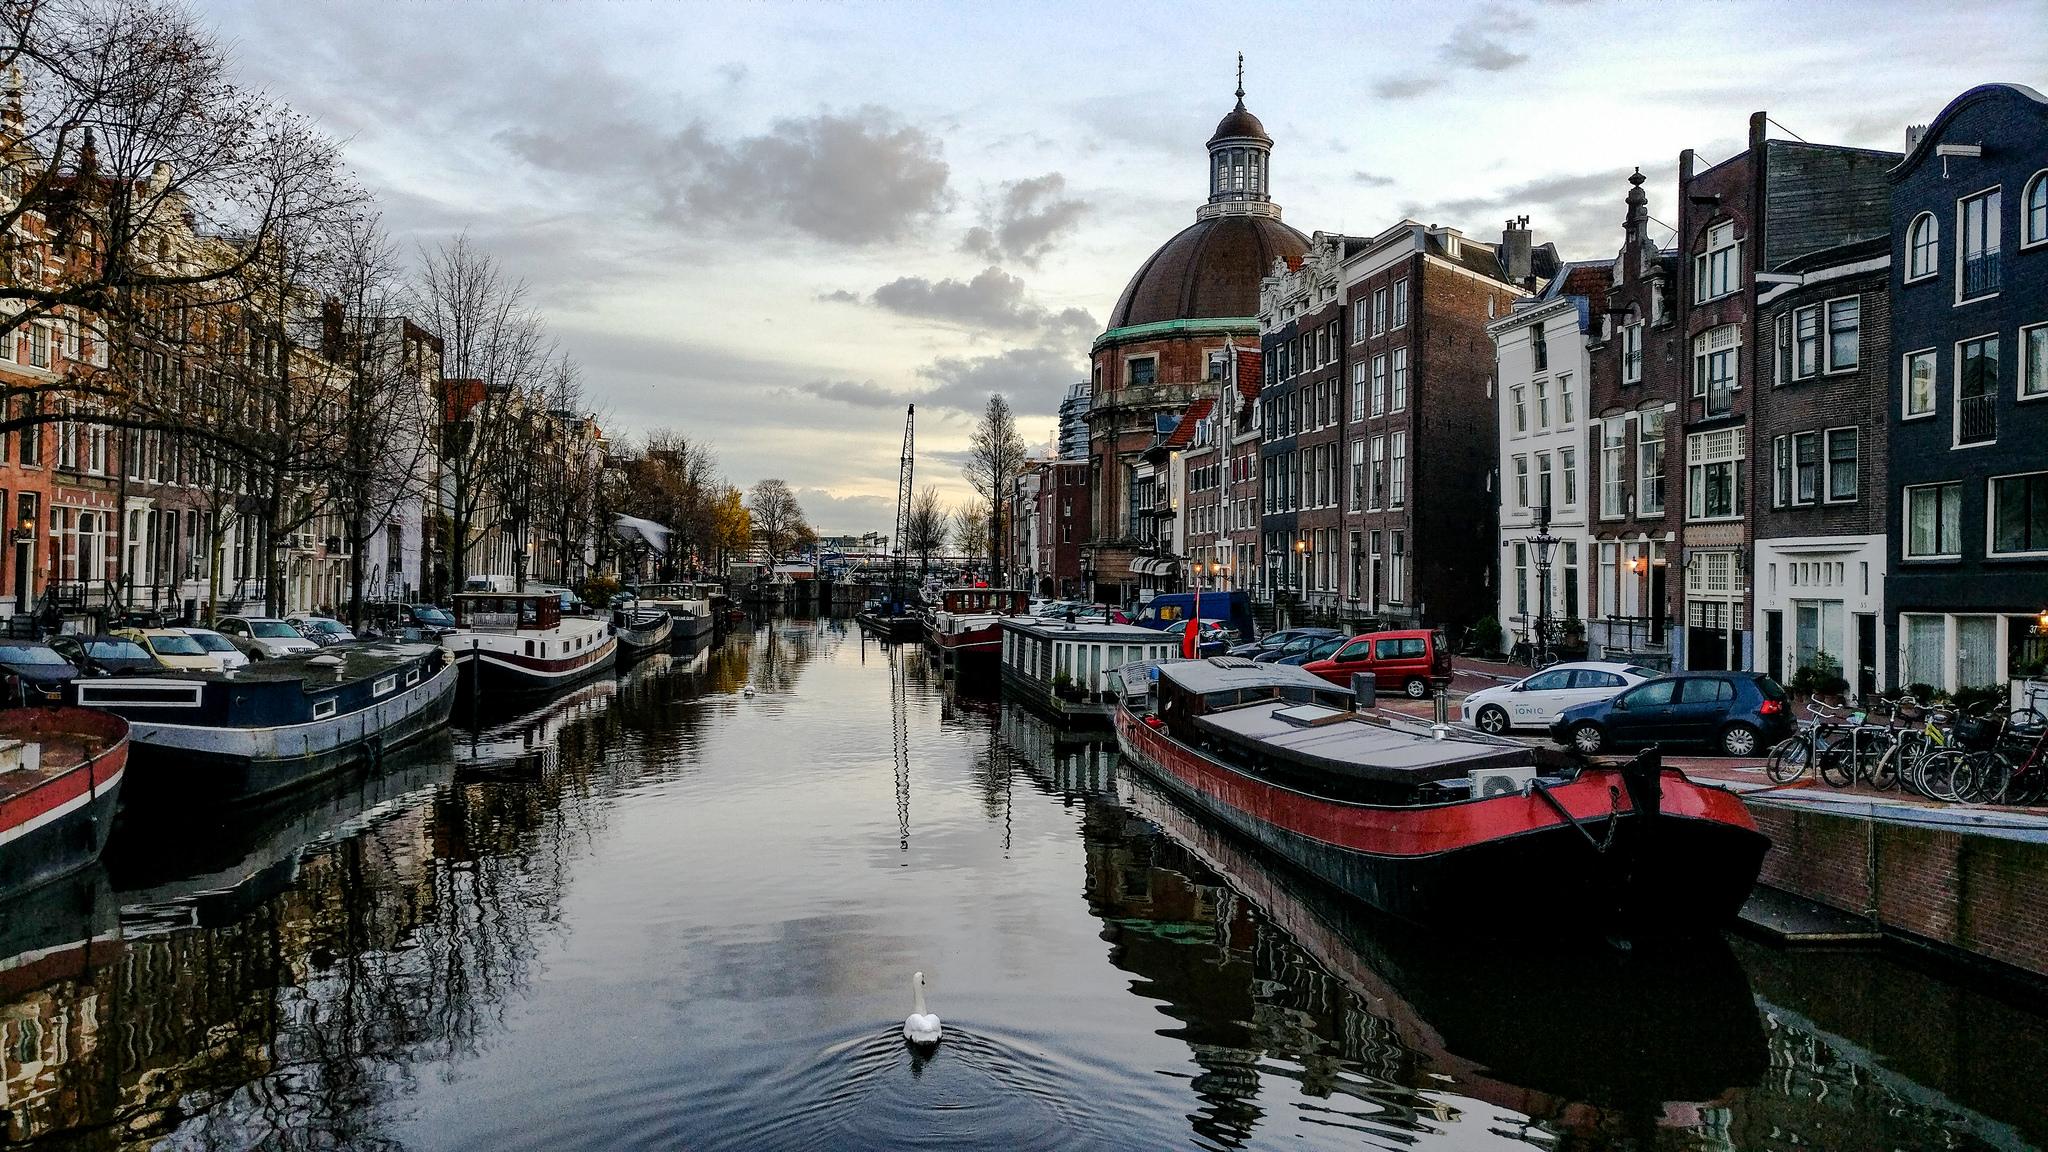 Amsterdam  #amsterdamcity #amsterdam #amsterdamcentral #canalcity #reflection #europe #morning